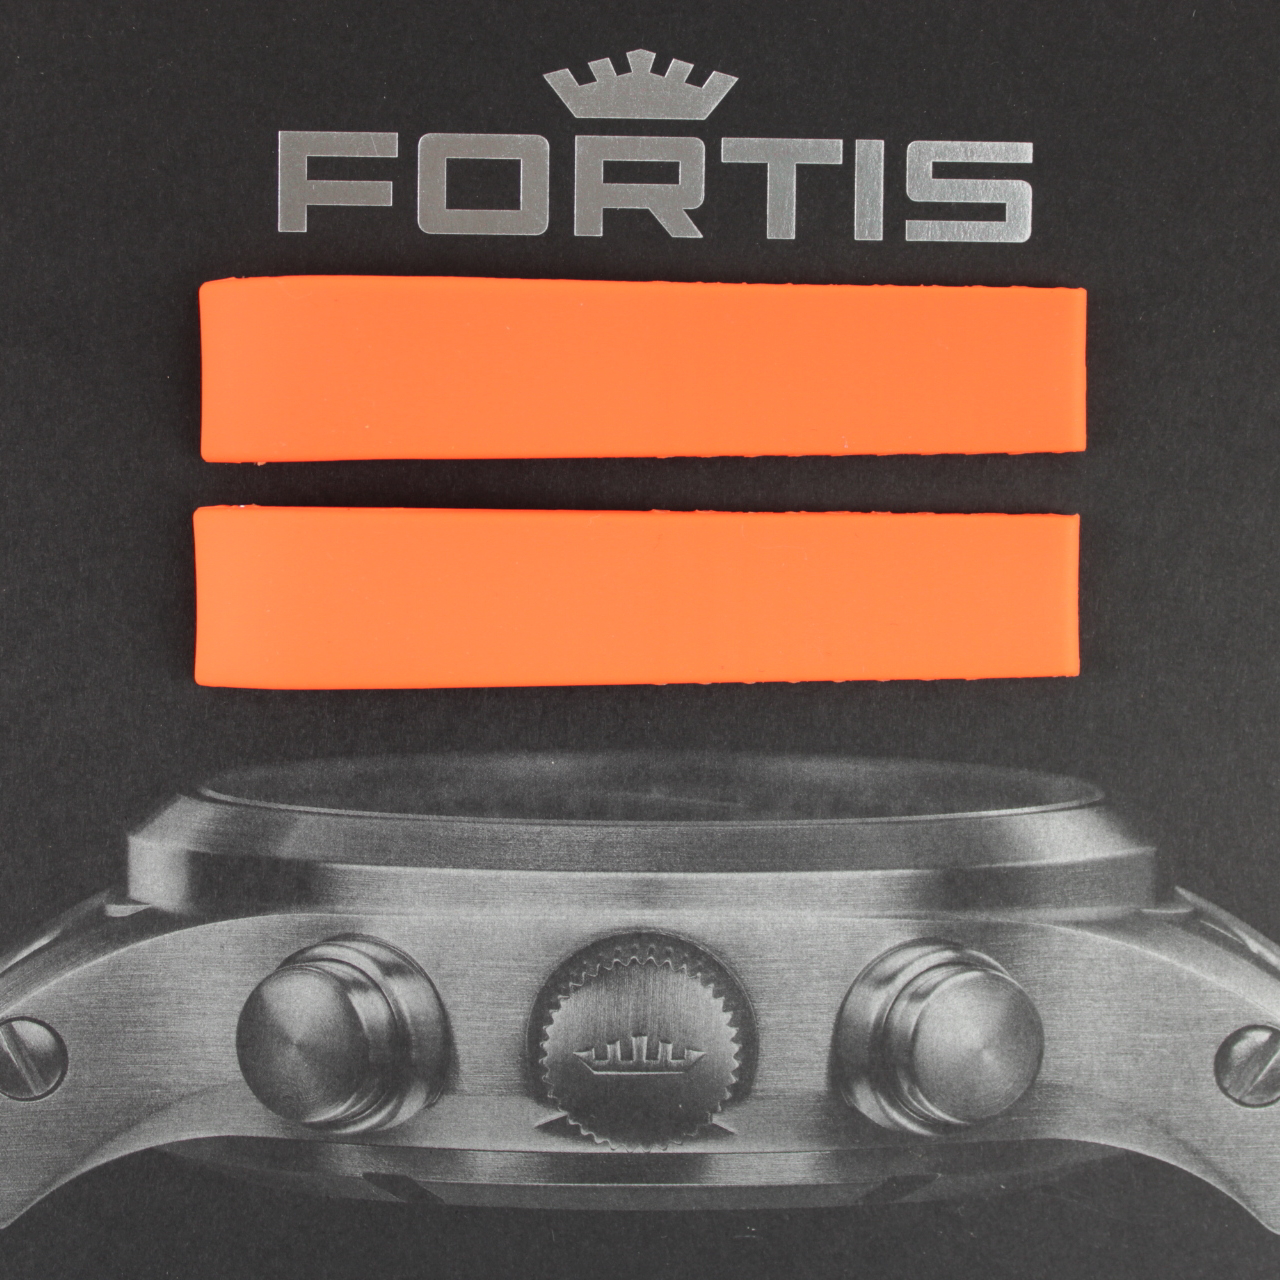 Fortis Silikonband mit integrierten Anstoß orange